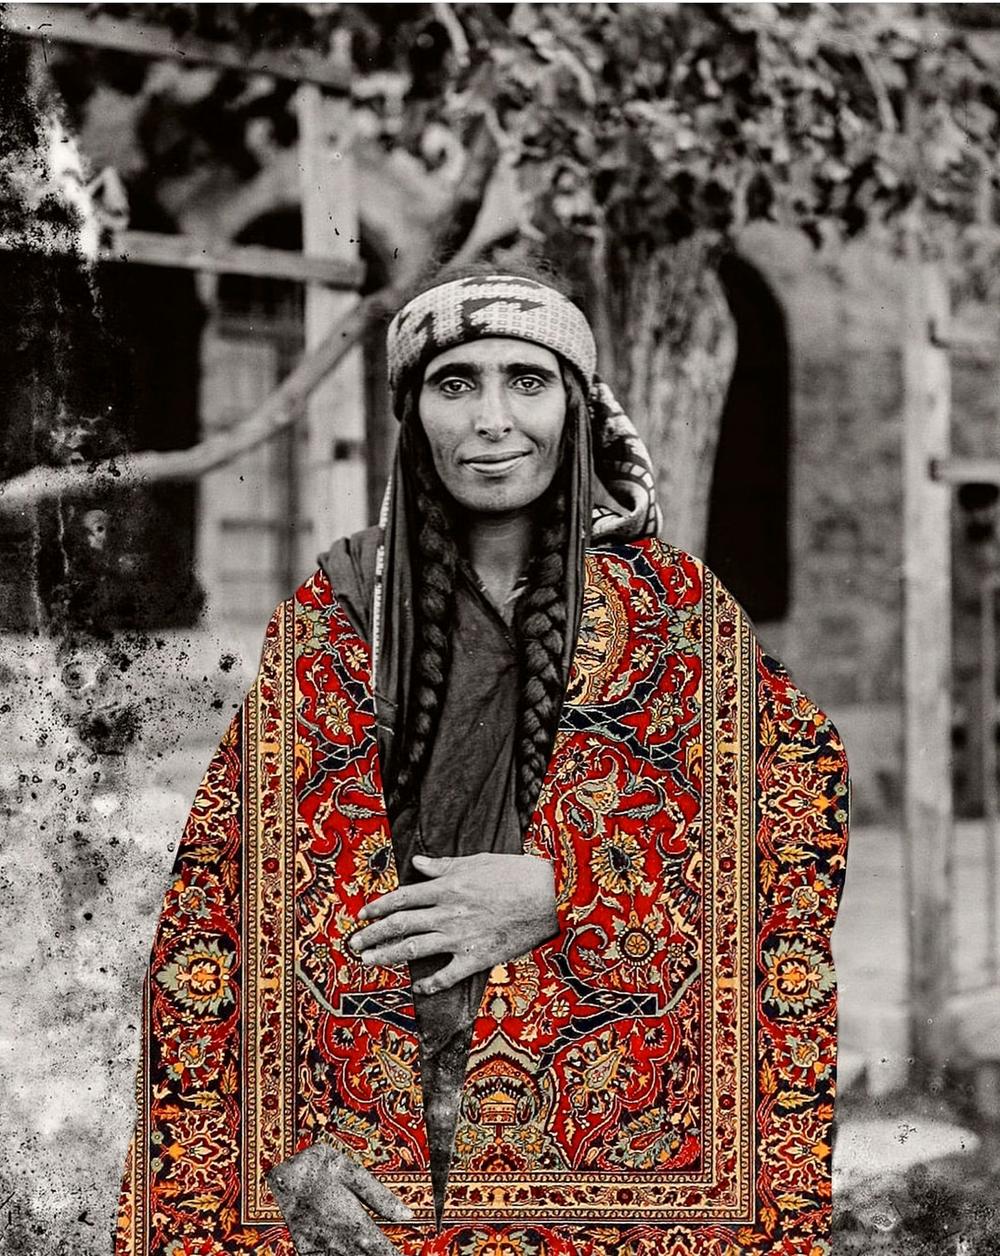 <b>Beya Khalifa</b></br><i>Doppleganger</i></br>Antique photograph and digital collage</br>Limited edition of 20</br>16 x 12 in